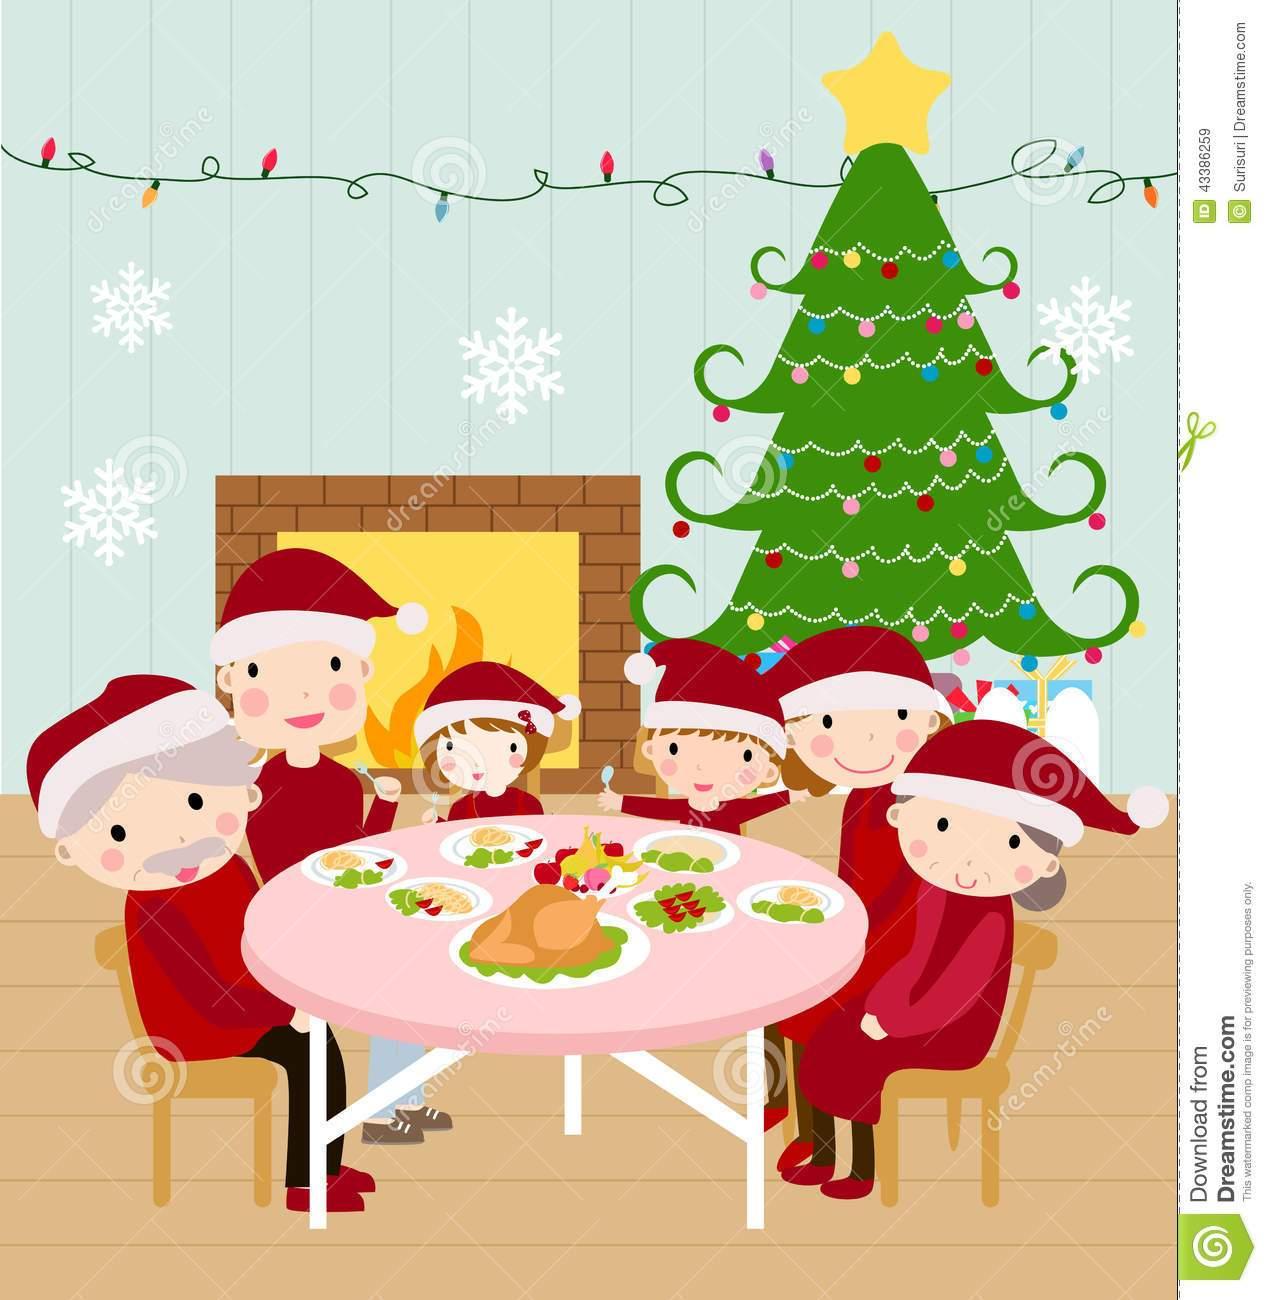 Family christmas dinner clipart 9 » Clipart Portal.